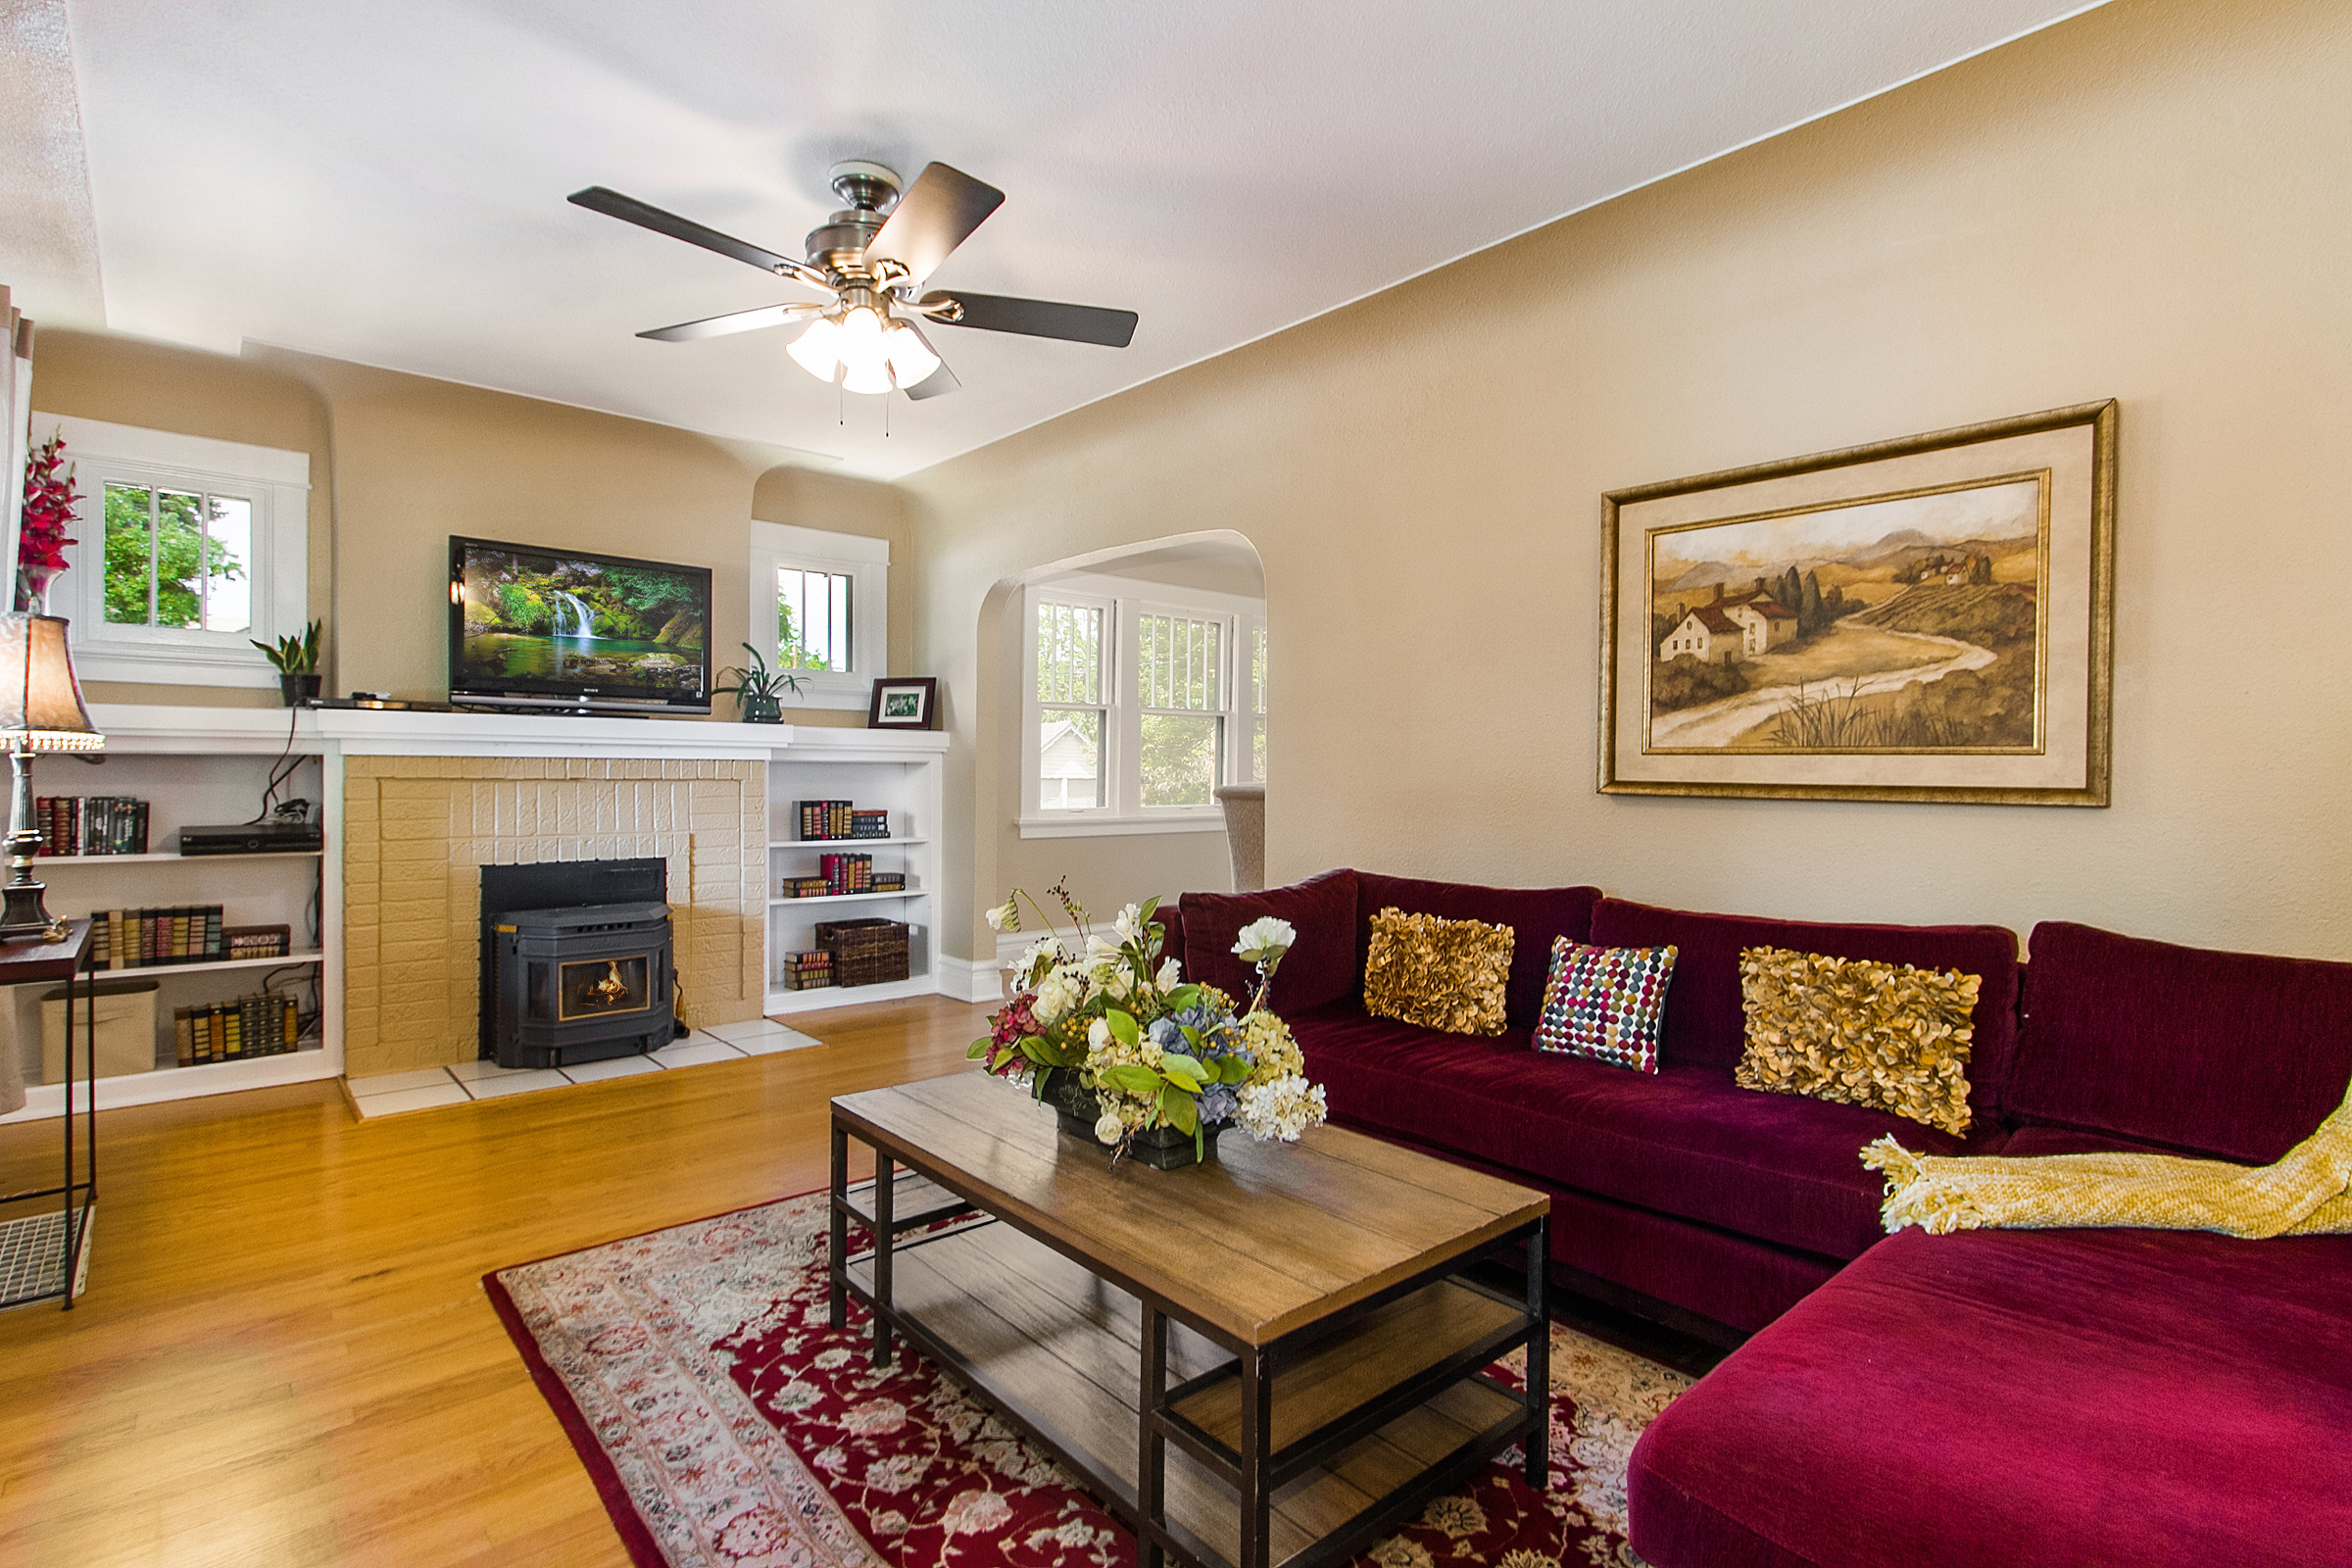 1316338_Living-Room-Has-Pellet-Stove--amp--Bookcases_high.jpg